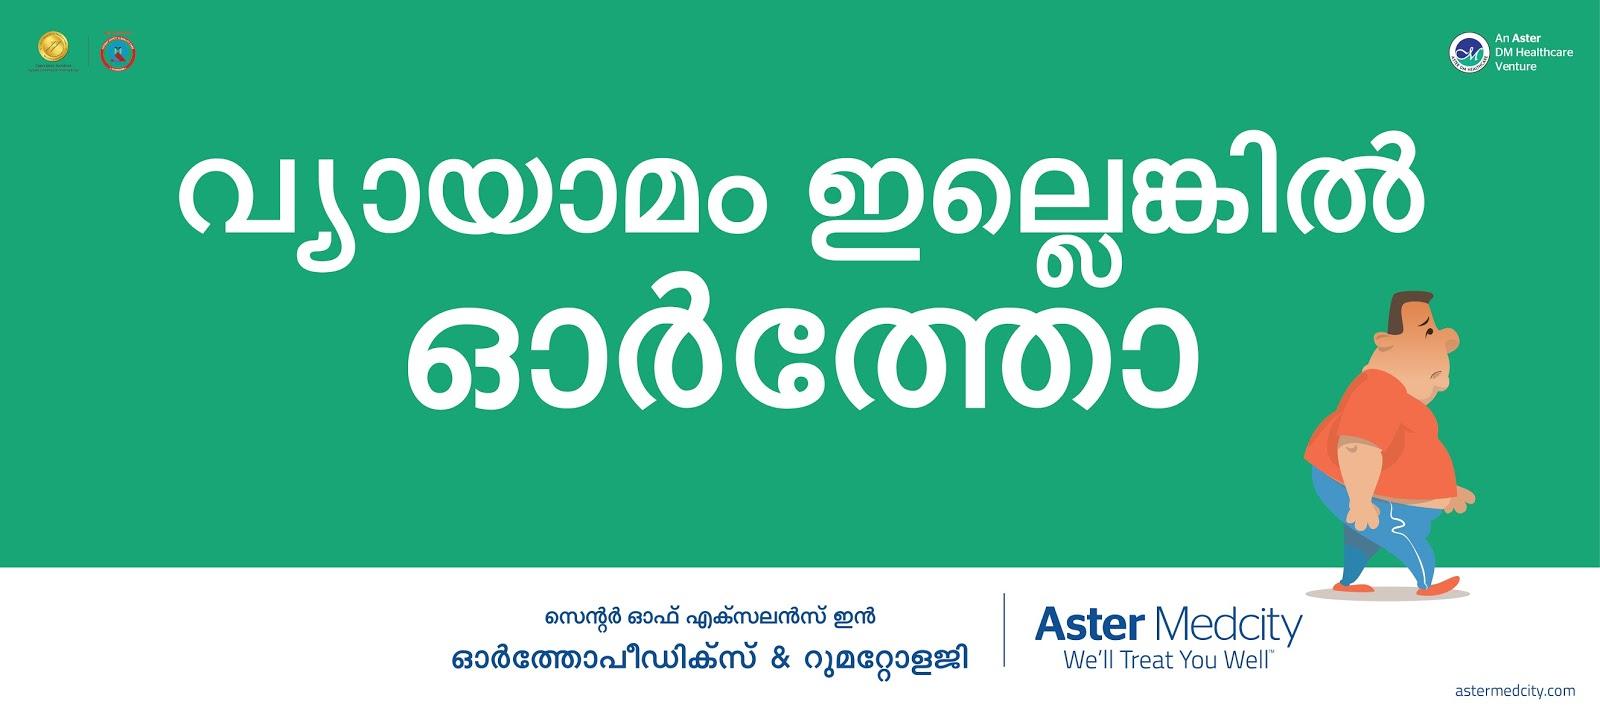 Aster Medcity - 24x7 Ortho Surgery | Print mock-up 3 | Stark Communications Pvt Ltd